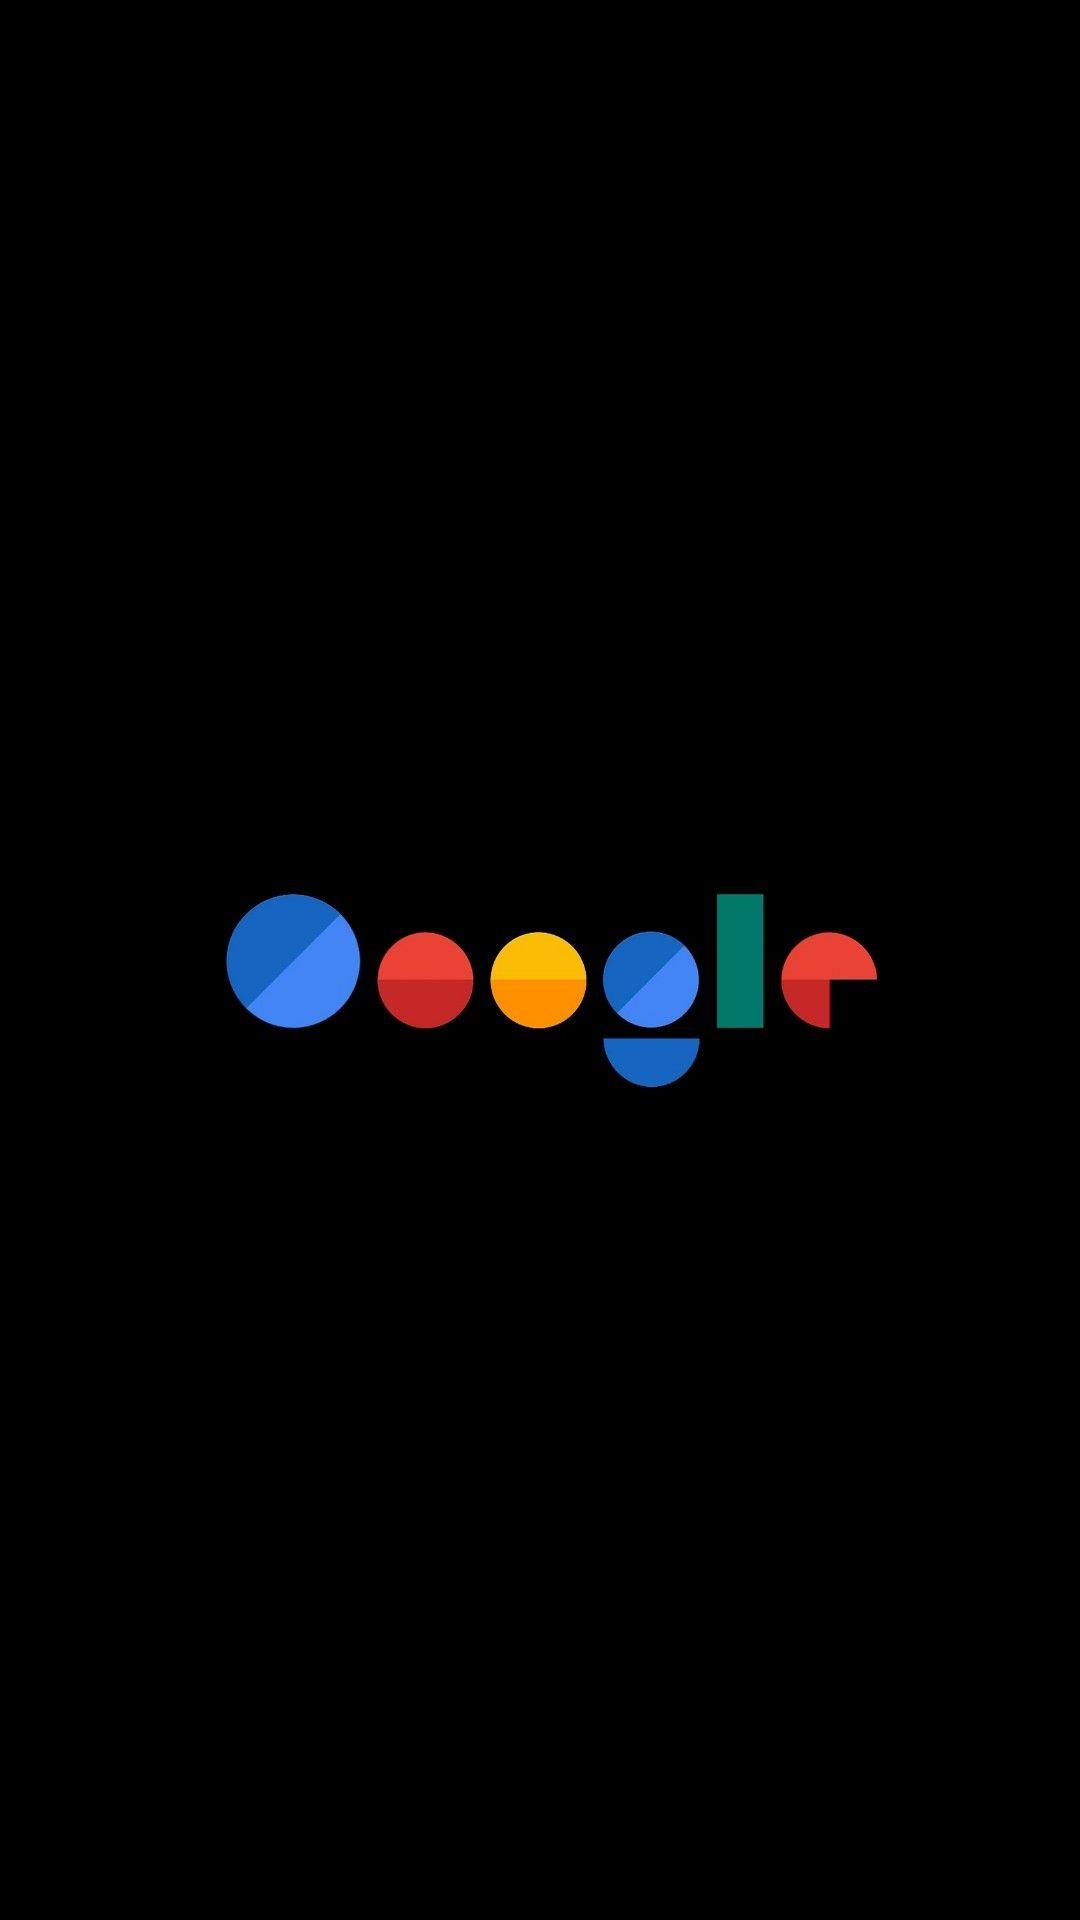 Pin by Samantha Keller on Google Abstract iphone